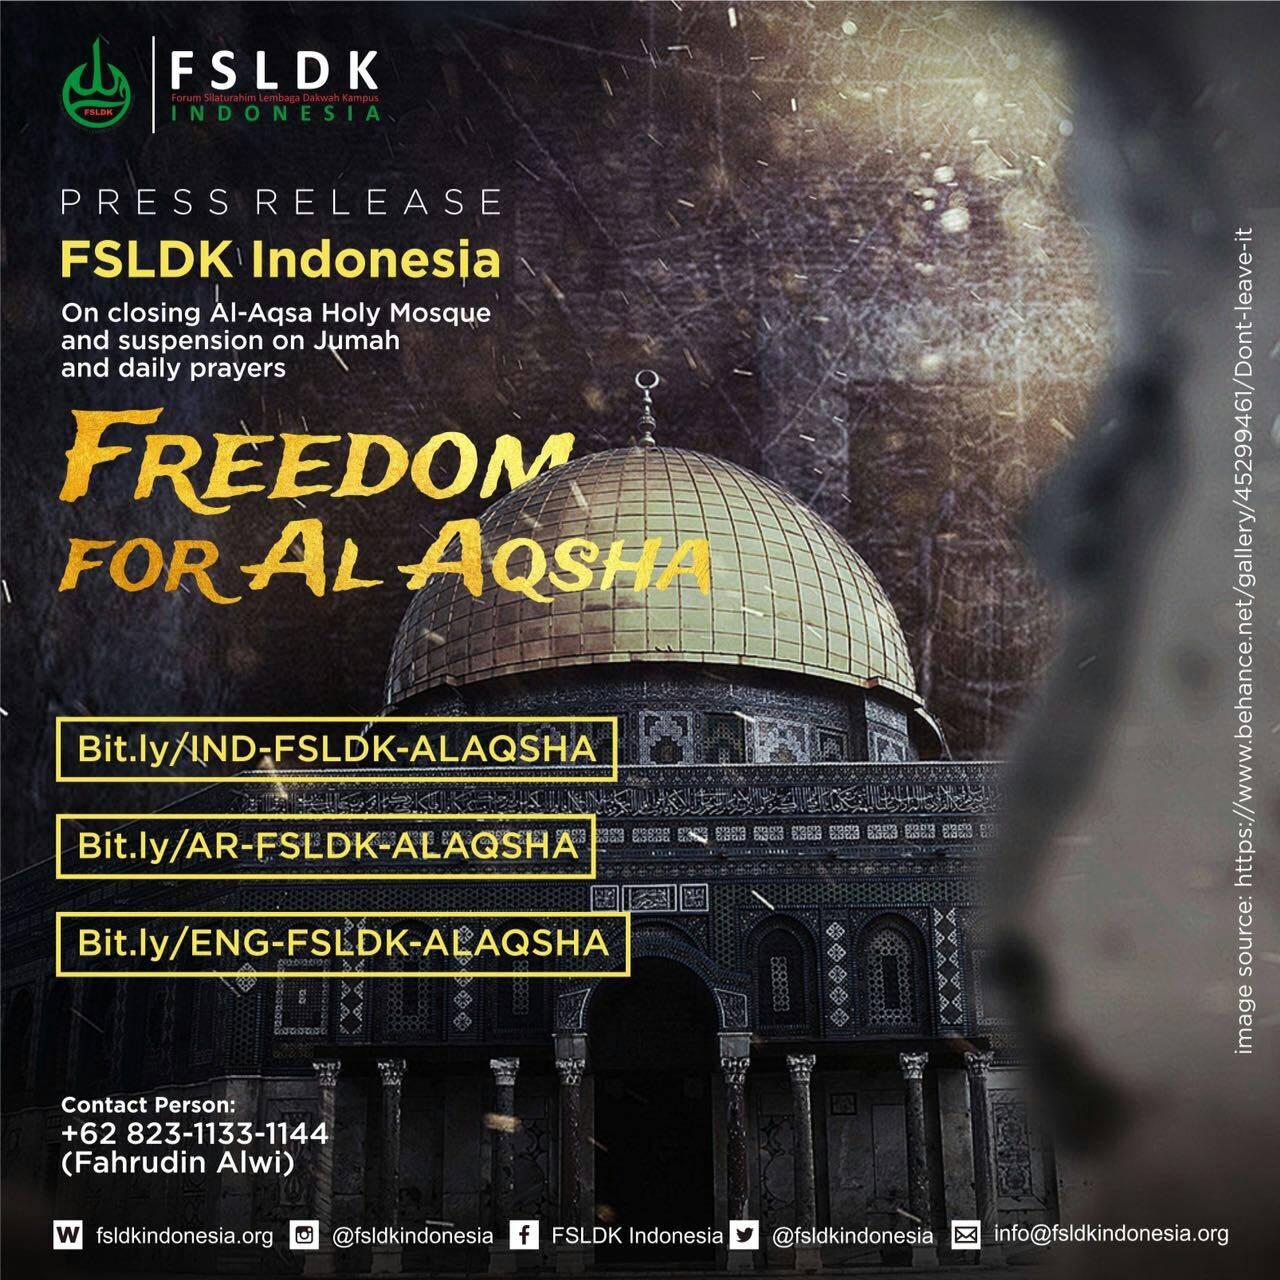 freedom of information indonesia 3 oktober 2017 dpr komitmen implementasikan open parliament indonesia direktur indonesia parliamentary center (ipc), ahmad hanafi â mengadakan pertemuan bersama wakil ketu.